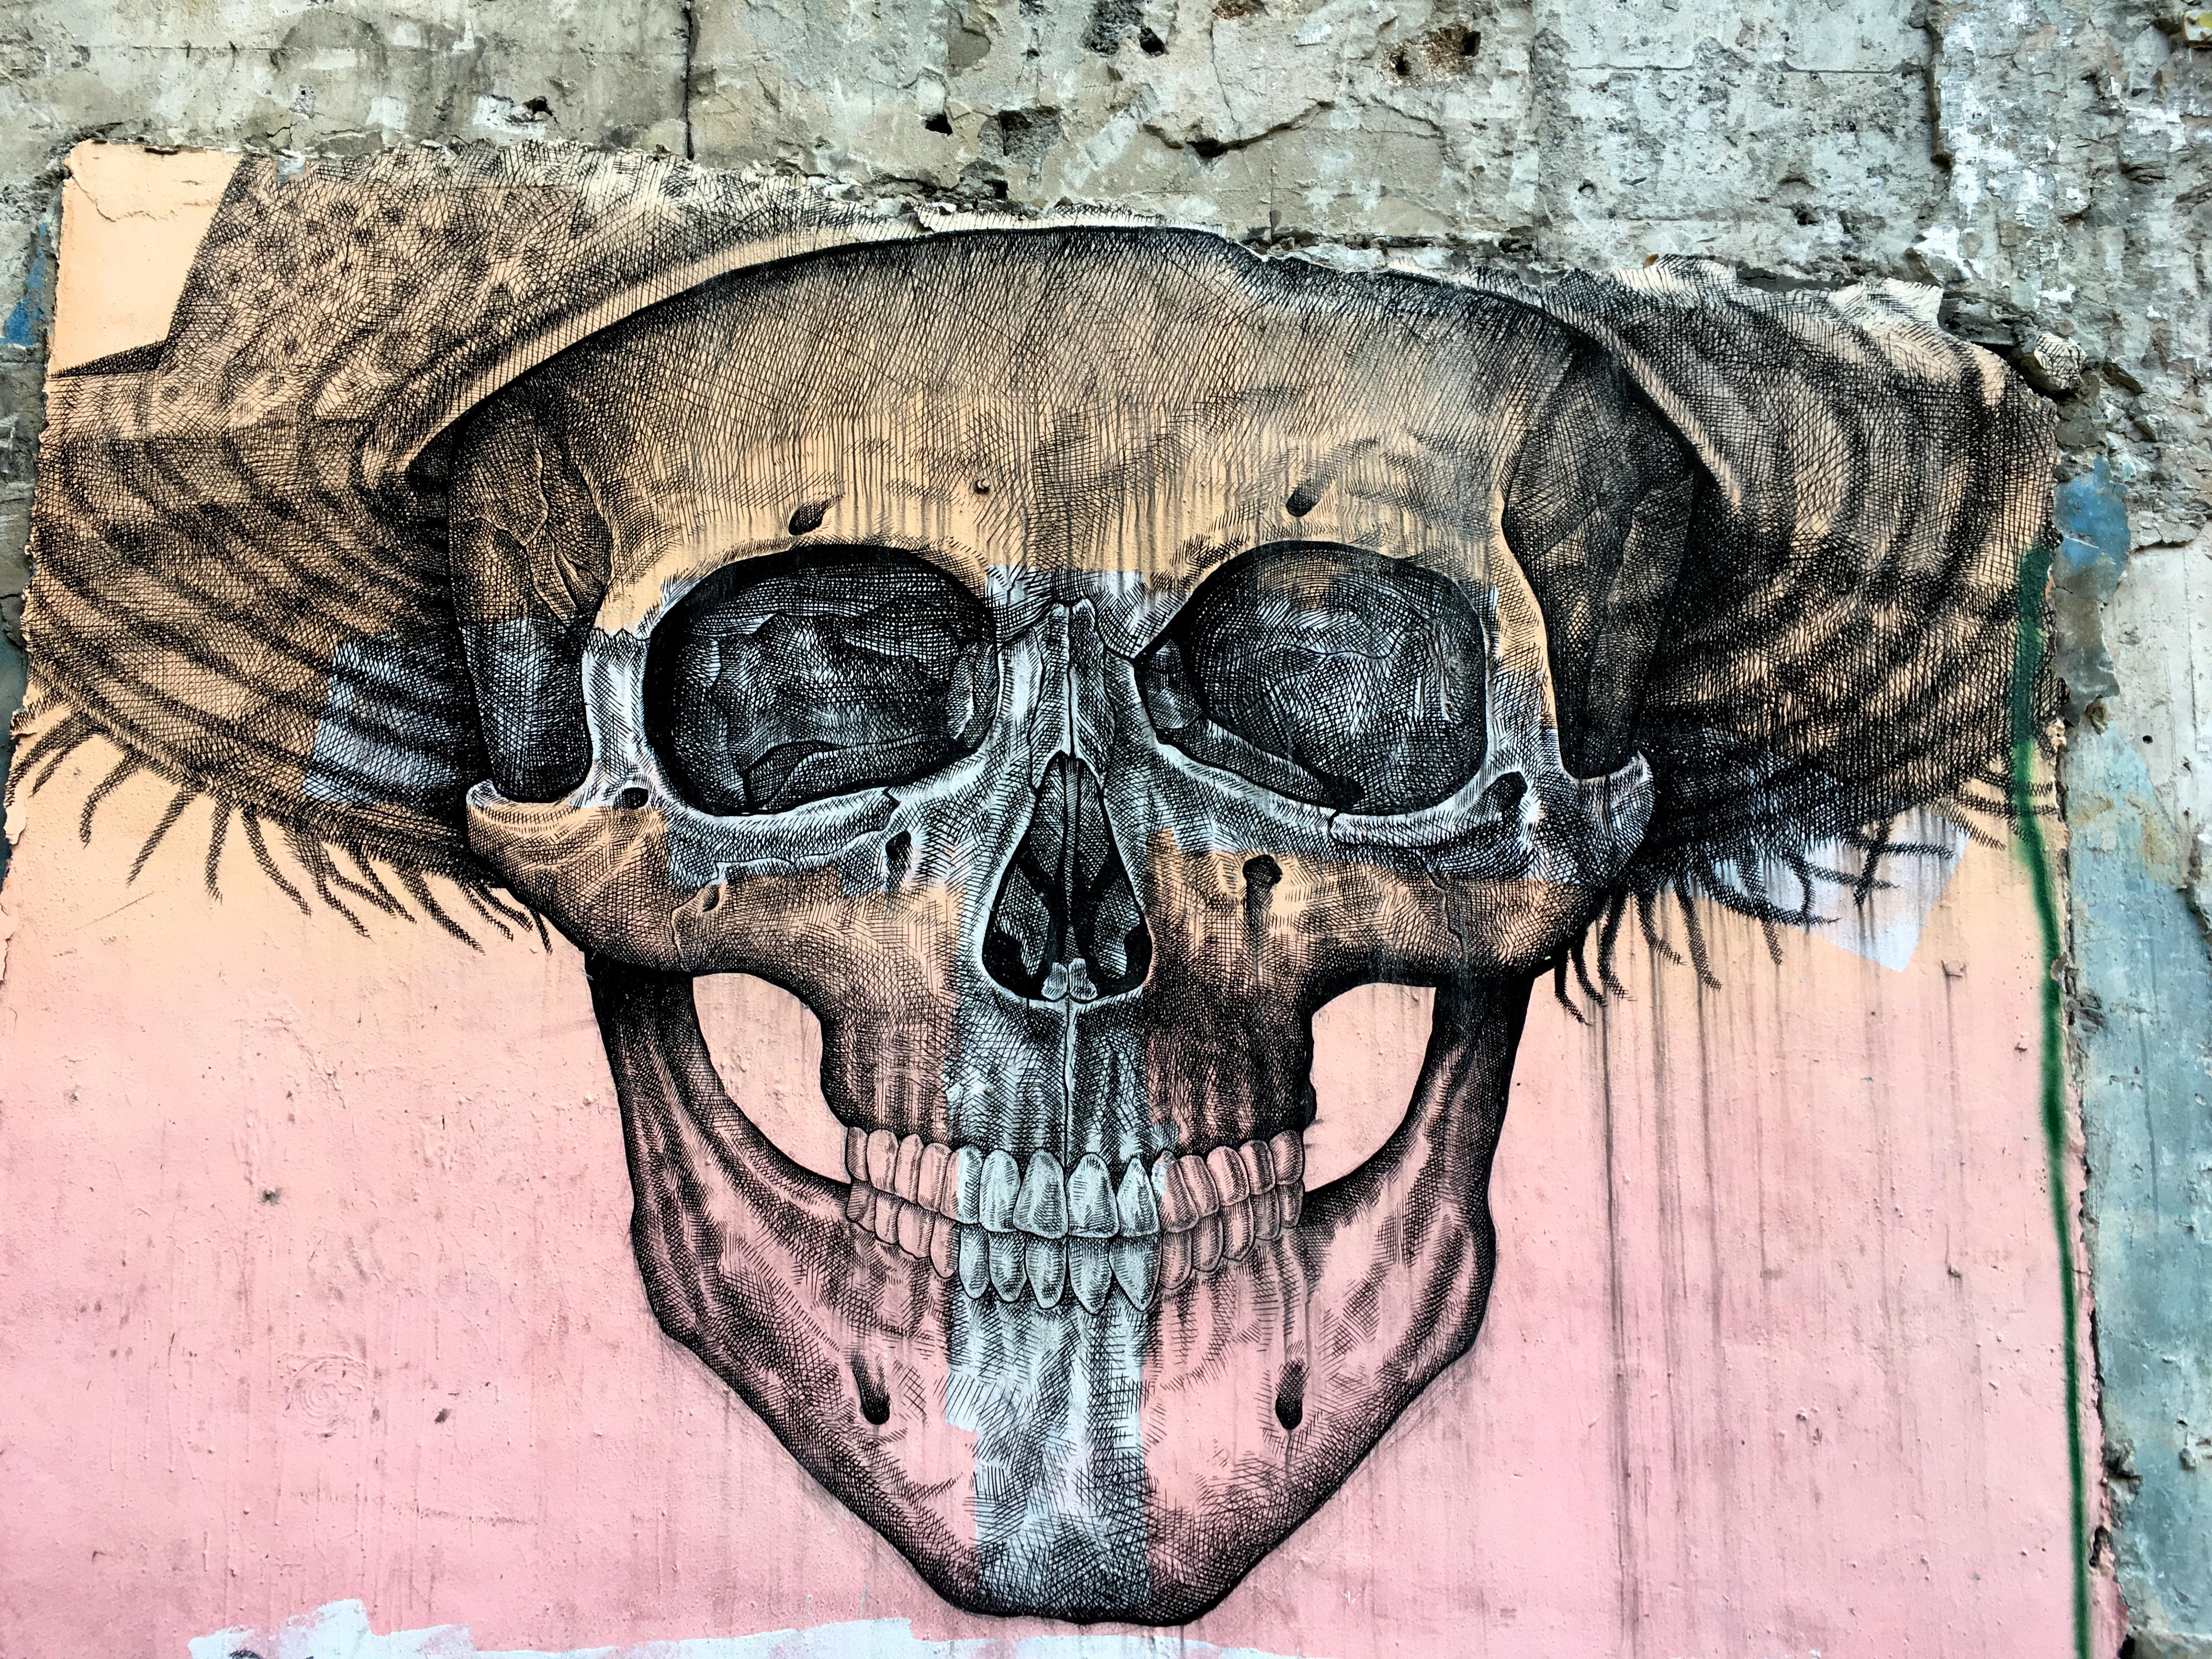 Gambar Tengkorak Tersenyum Tulang Sketsa Gambar